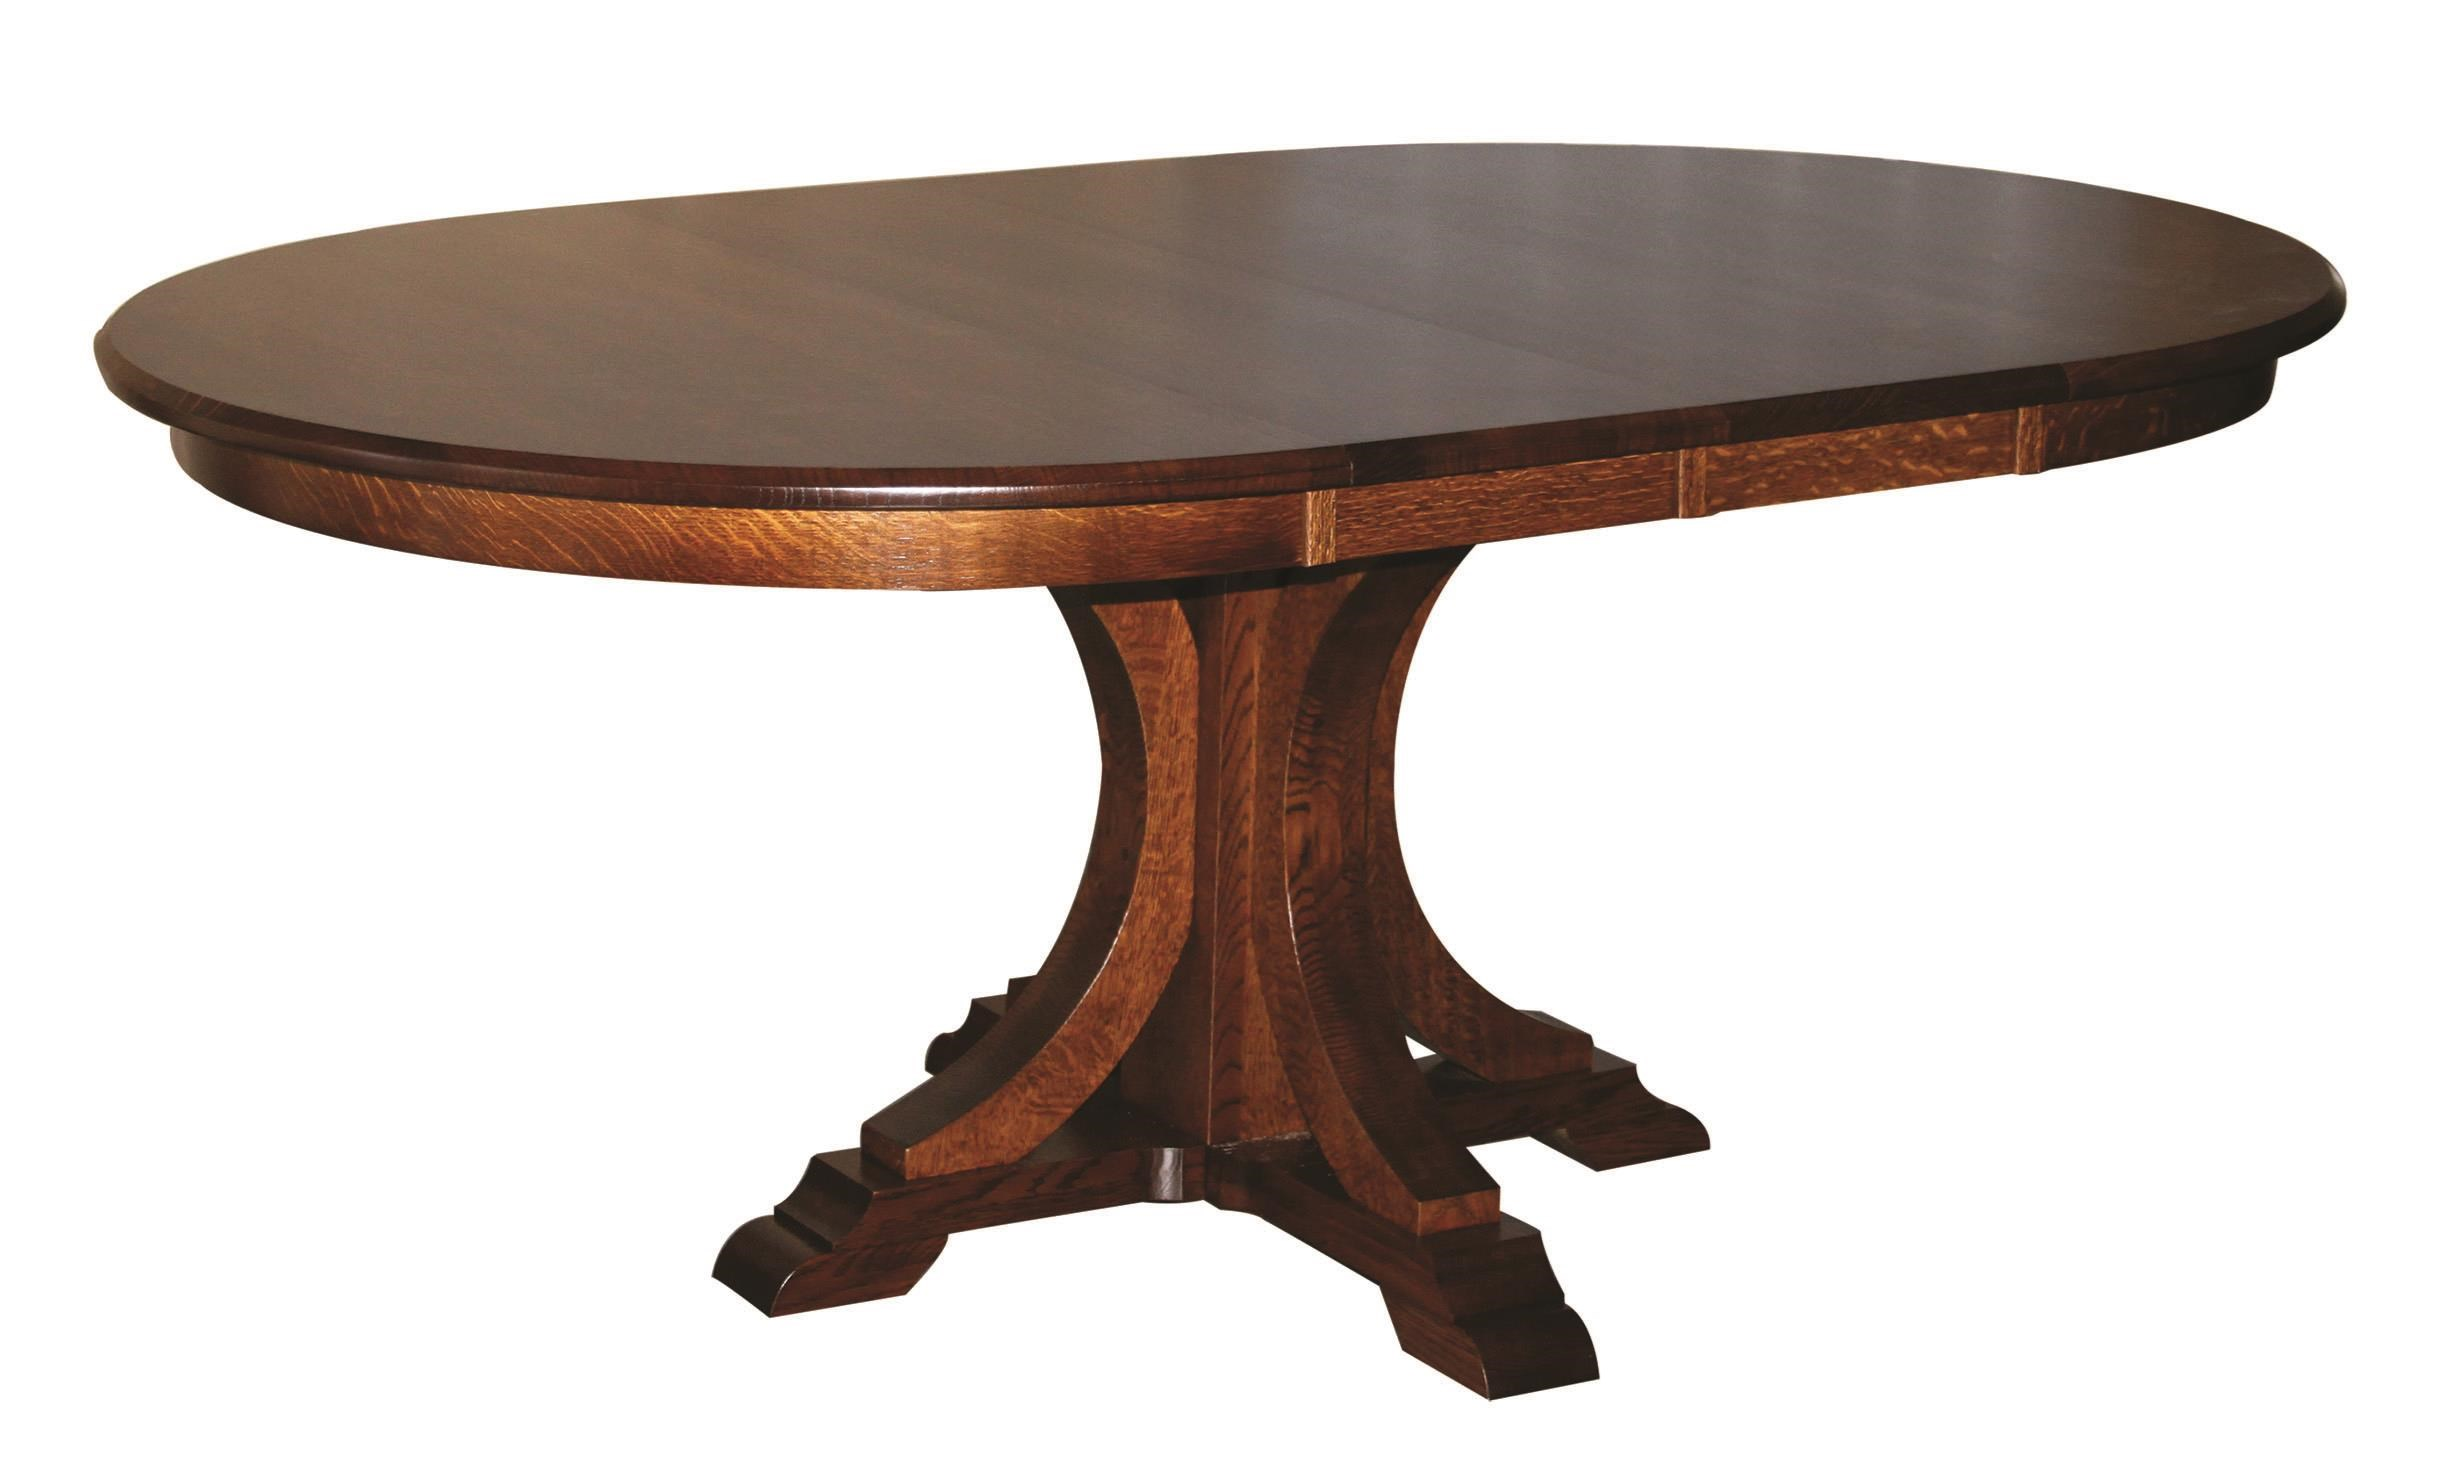 Kountry Knob Buckeye Single Pedestal Table by Wayside Custom Furniture at Wayside Furniture